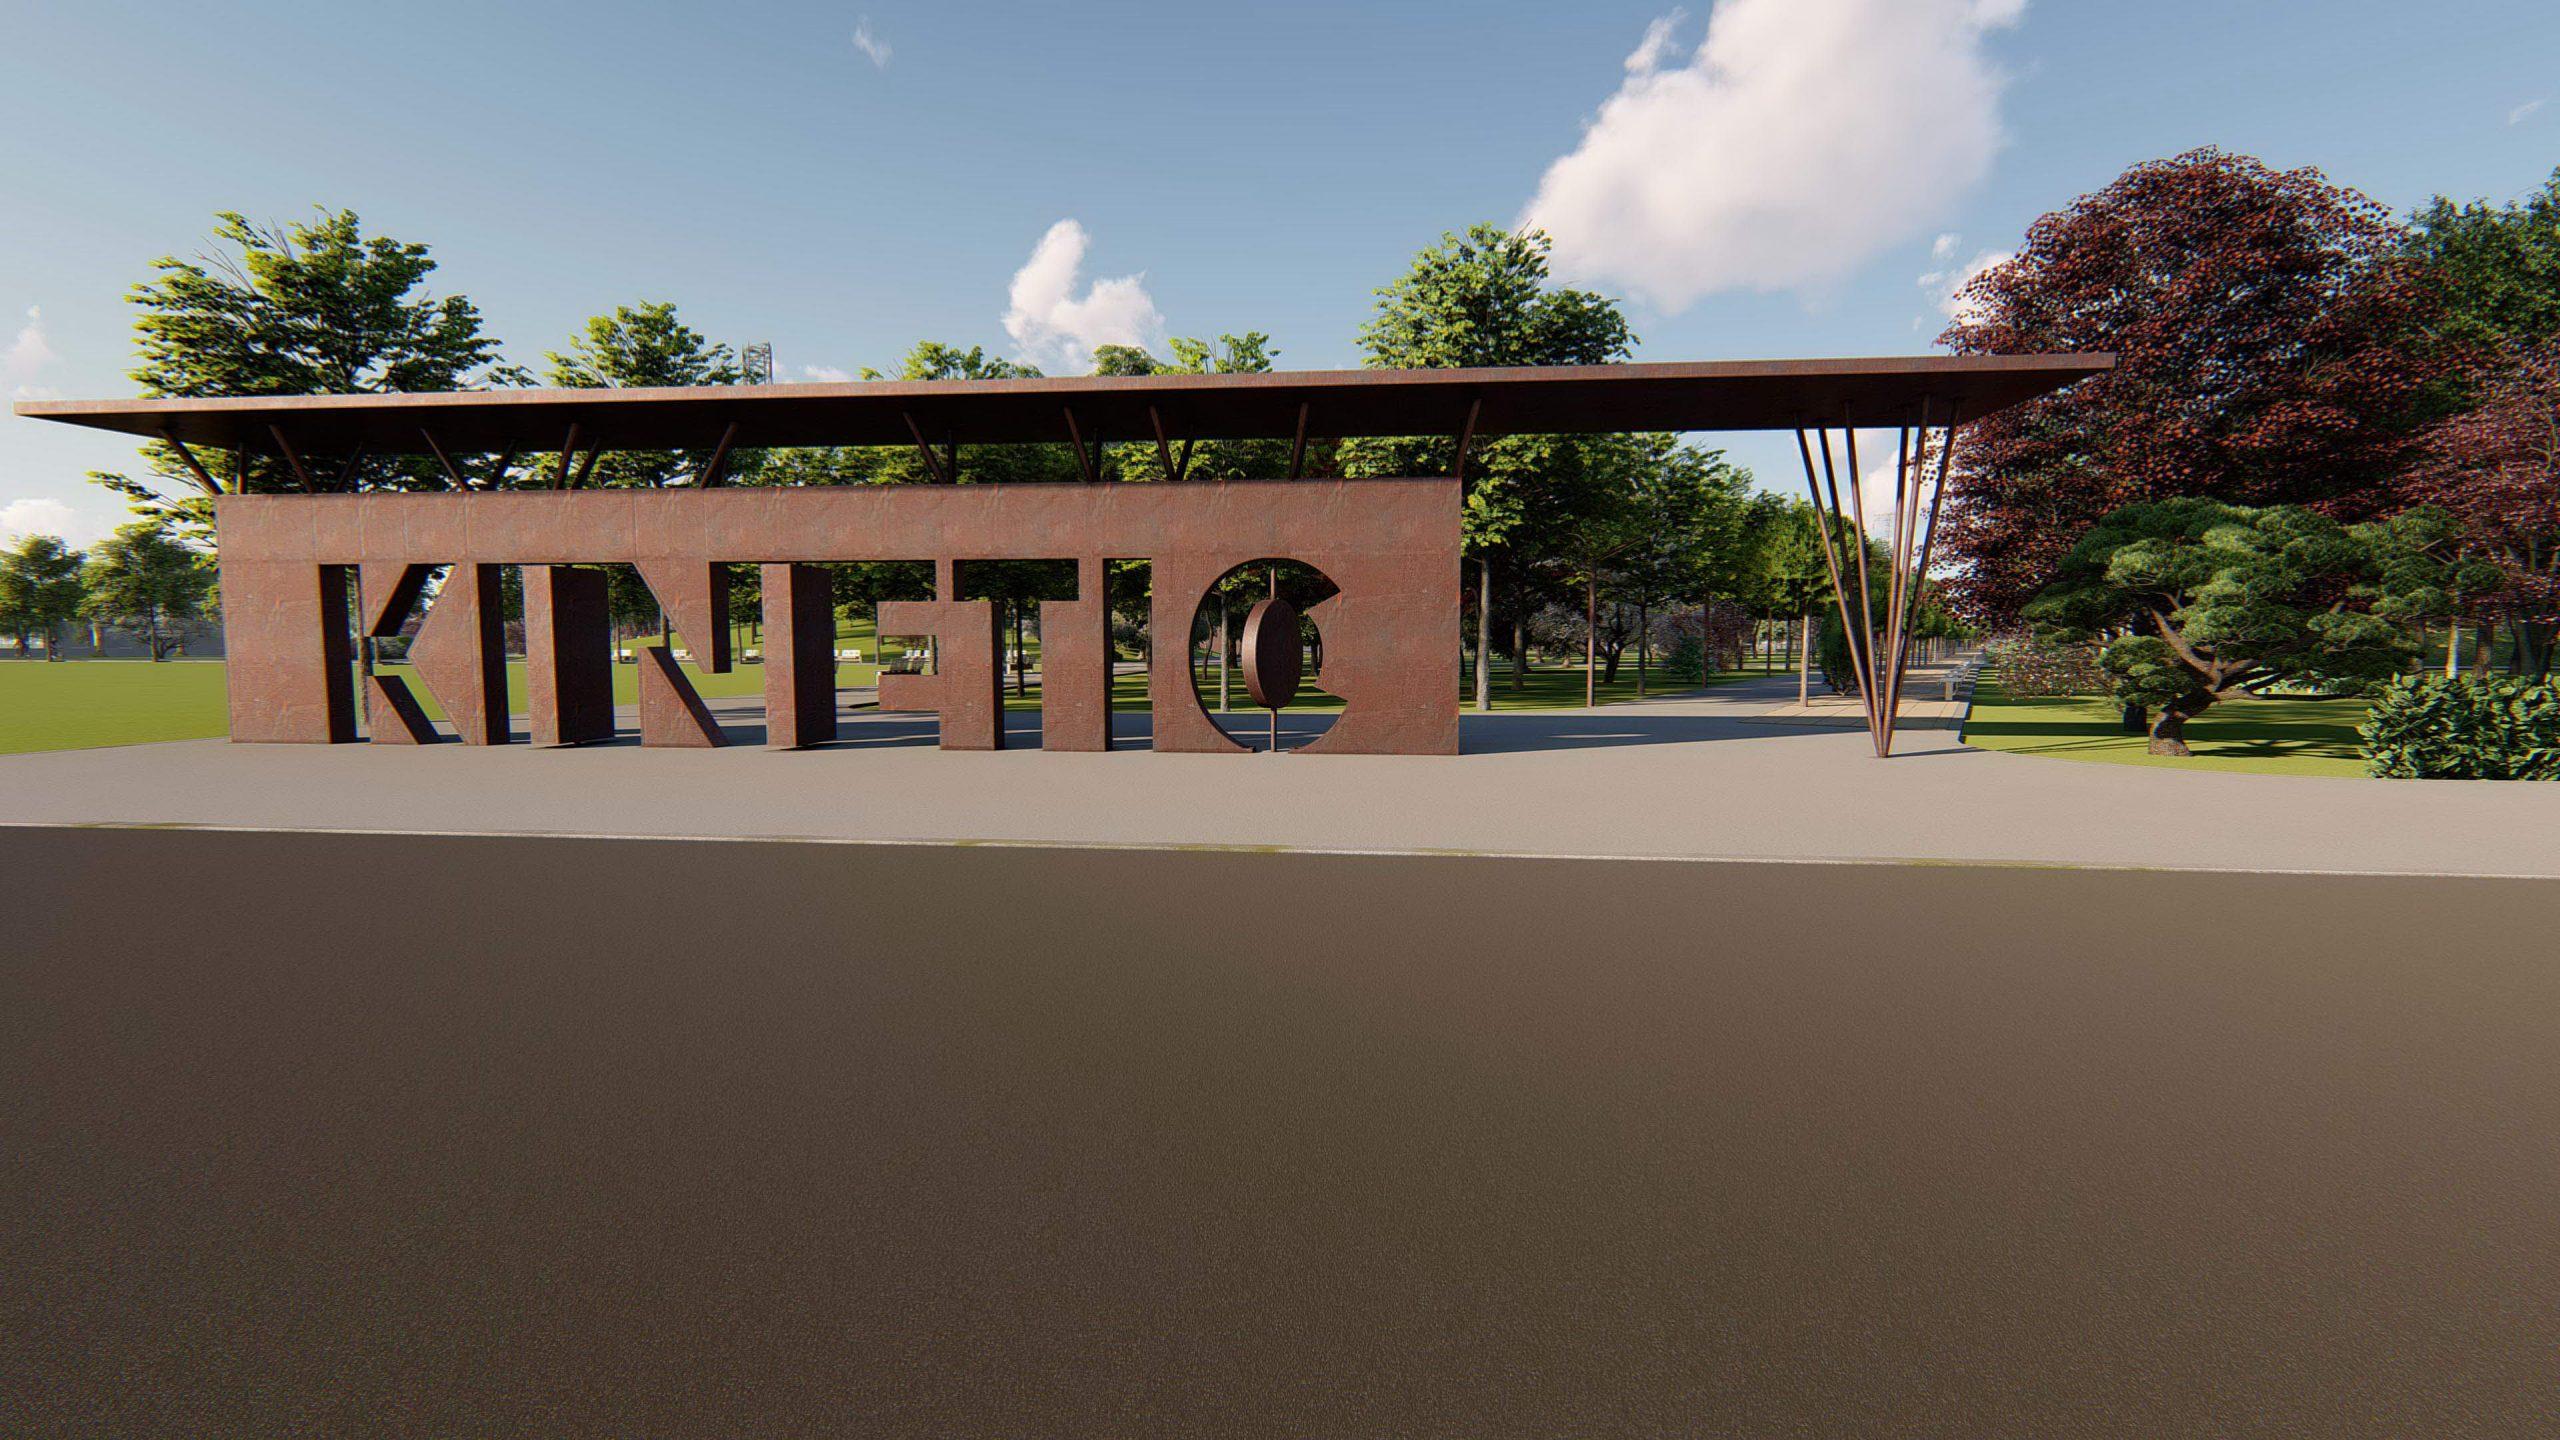 https://nbc-arhitect.ro/wp-content/uploads/2020/10/NBC-Arhitect-_-contests-_-Kinetik-Park-_-Cluj-Napoca-Romania_20-scaled.jpg